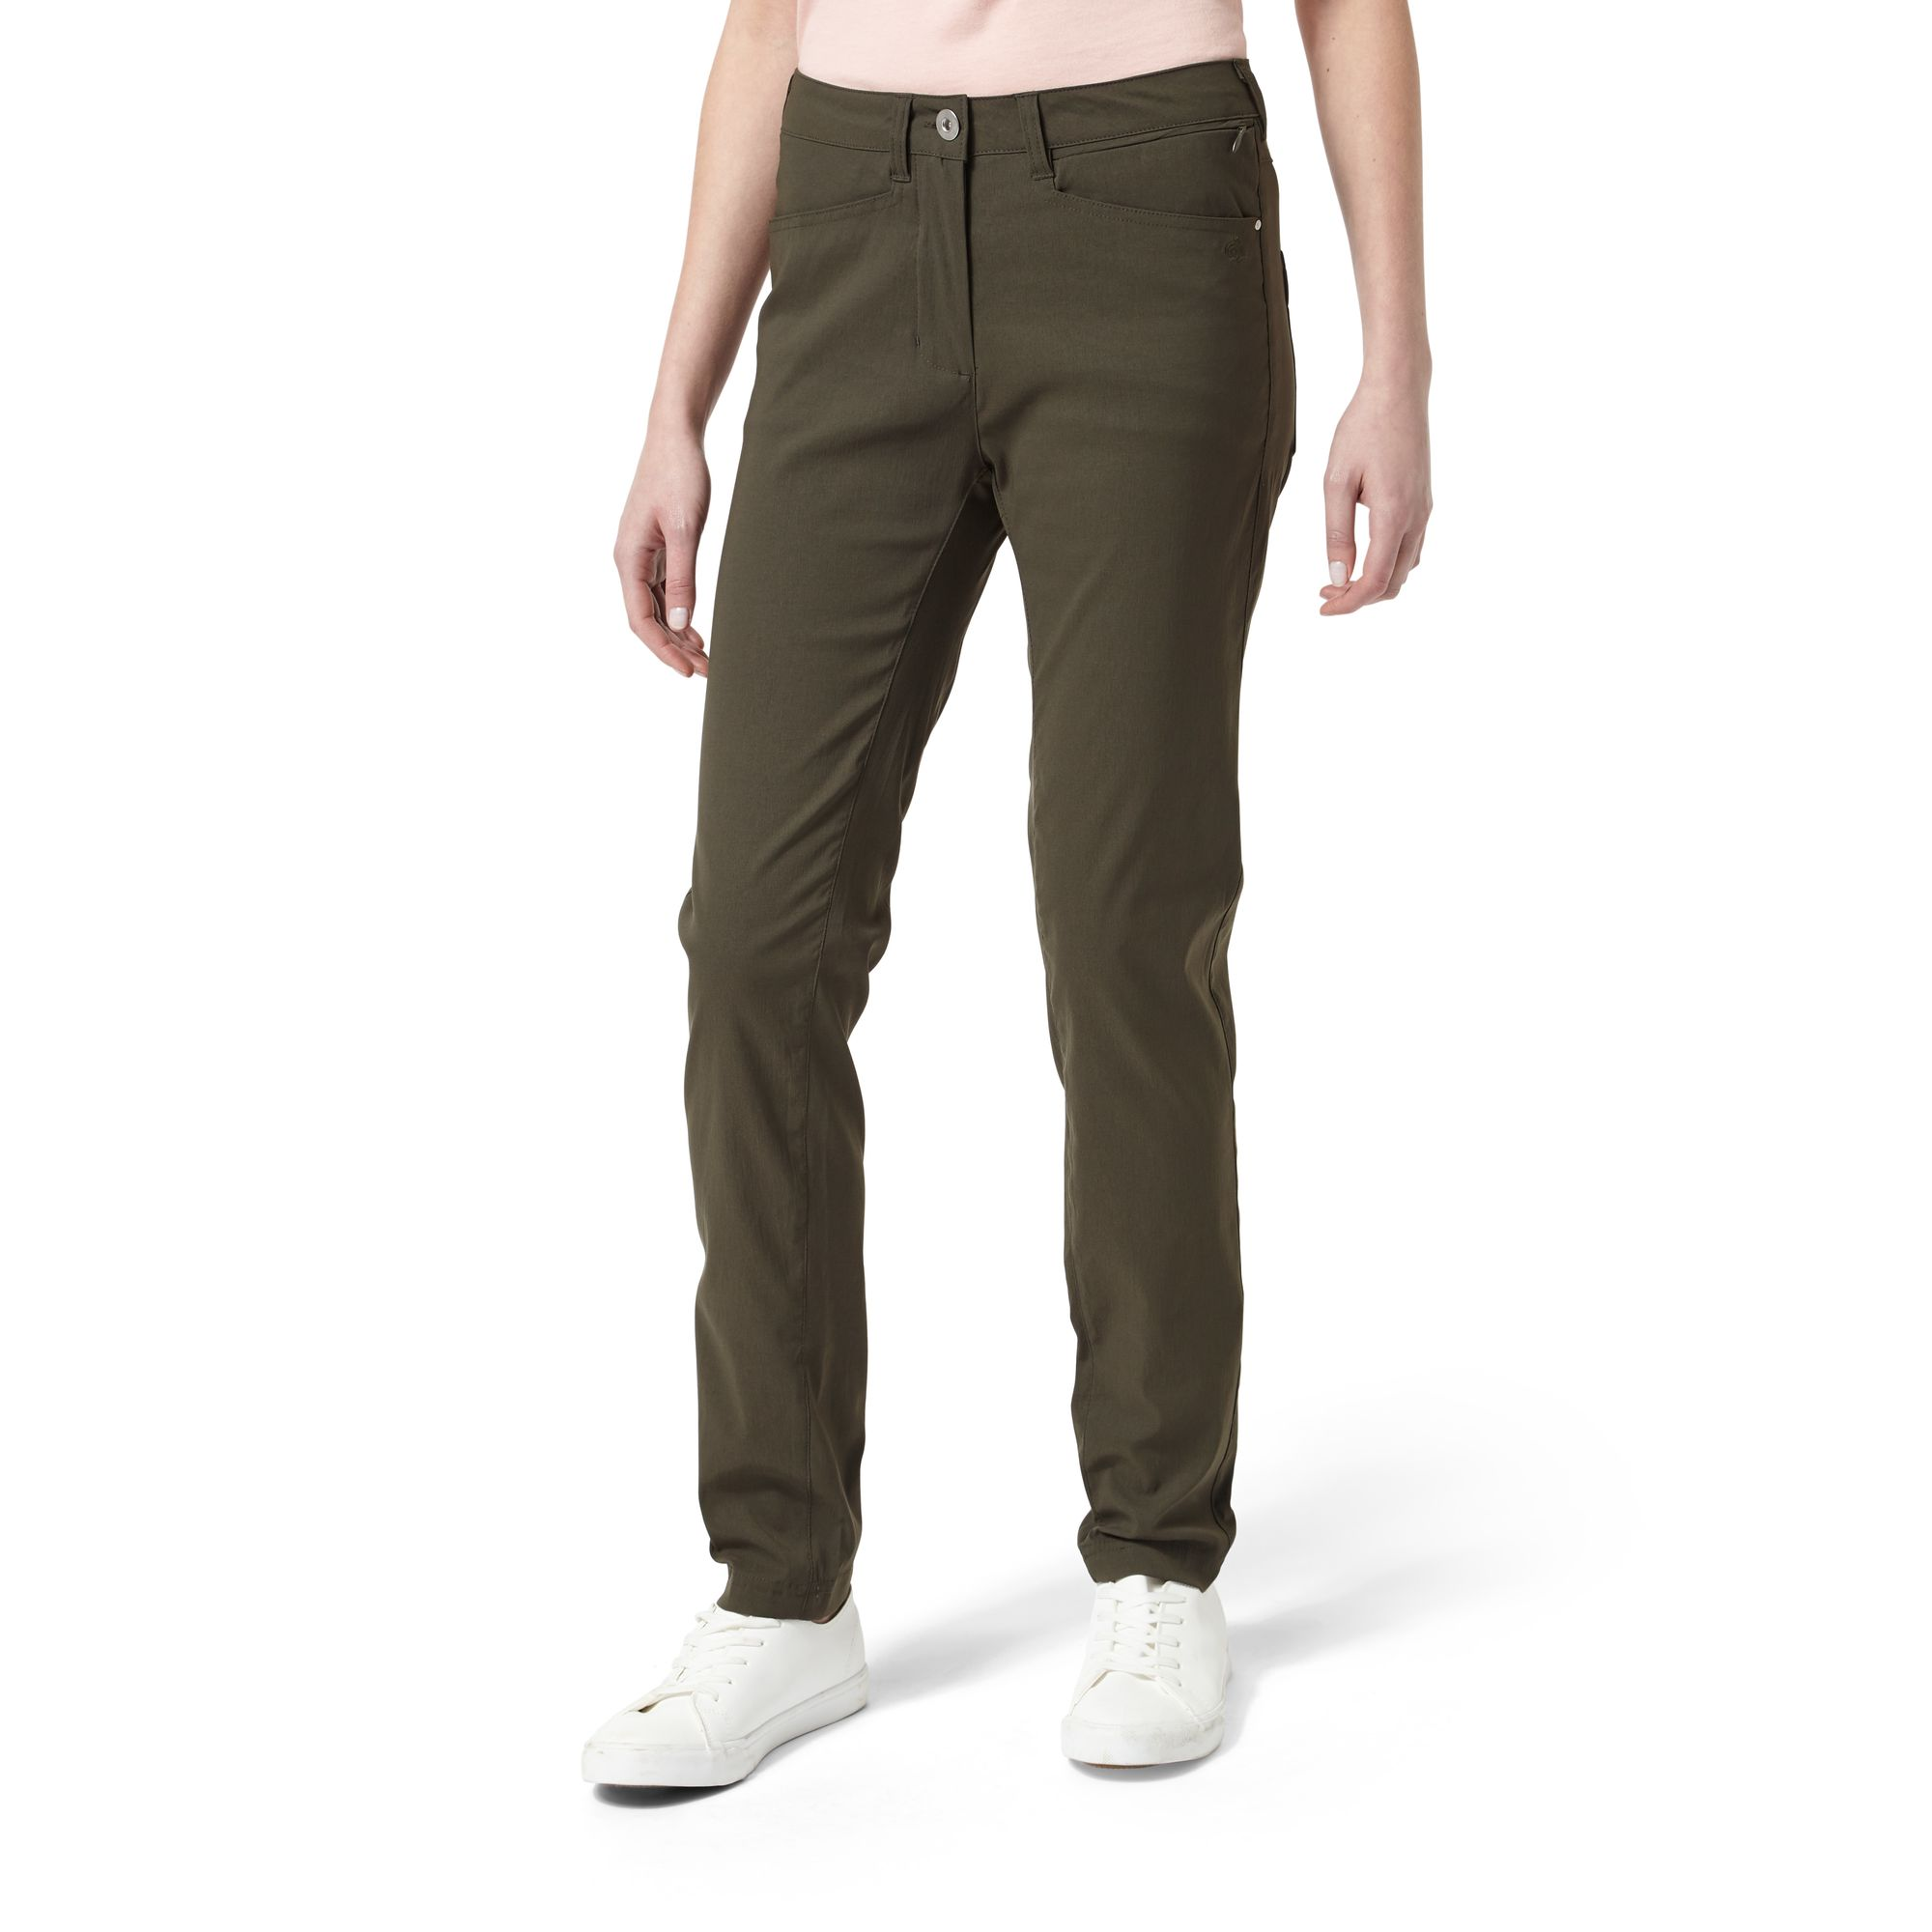 Craghoppers-Pantalon-ADVENTURE-Femme-CG869 miniature 4